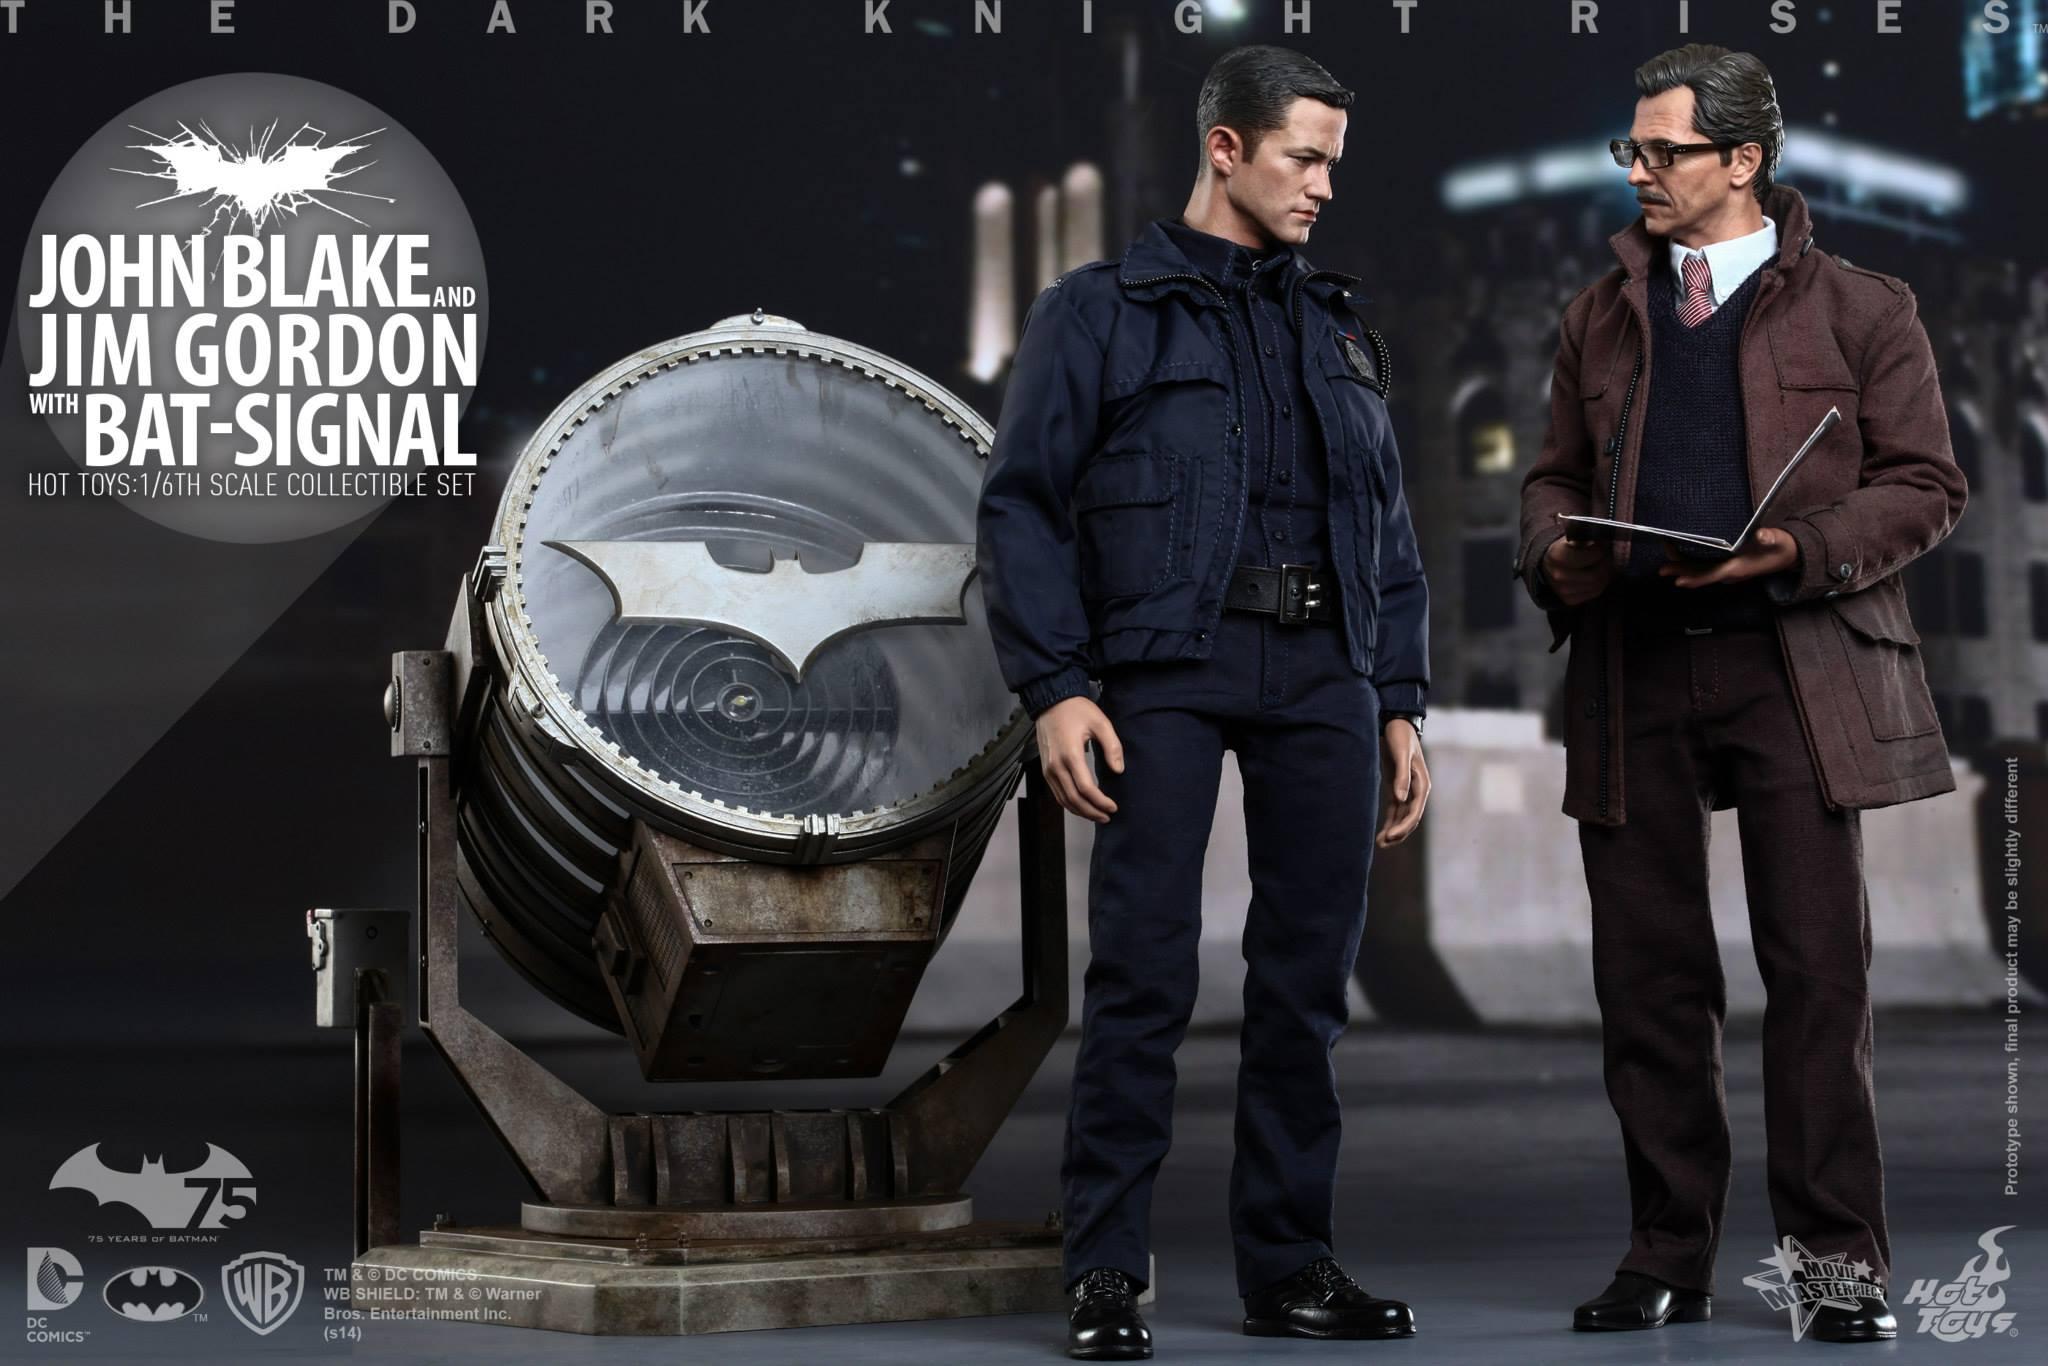 THE DARK KNIGHT RISES - Lt. JIM GORDON & JOHN BLAKE w/BATSIGNAL 153520104